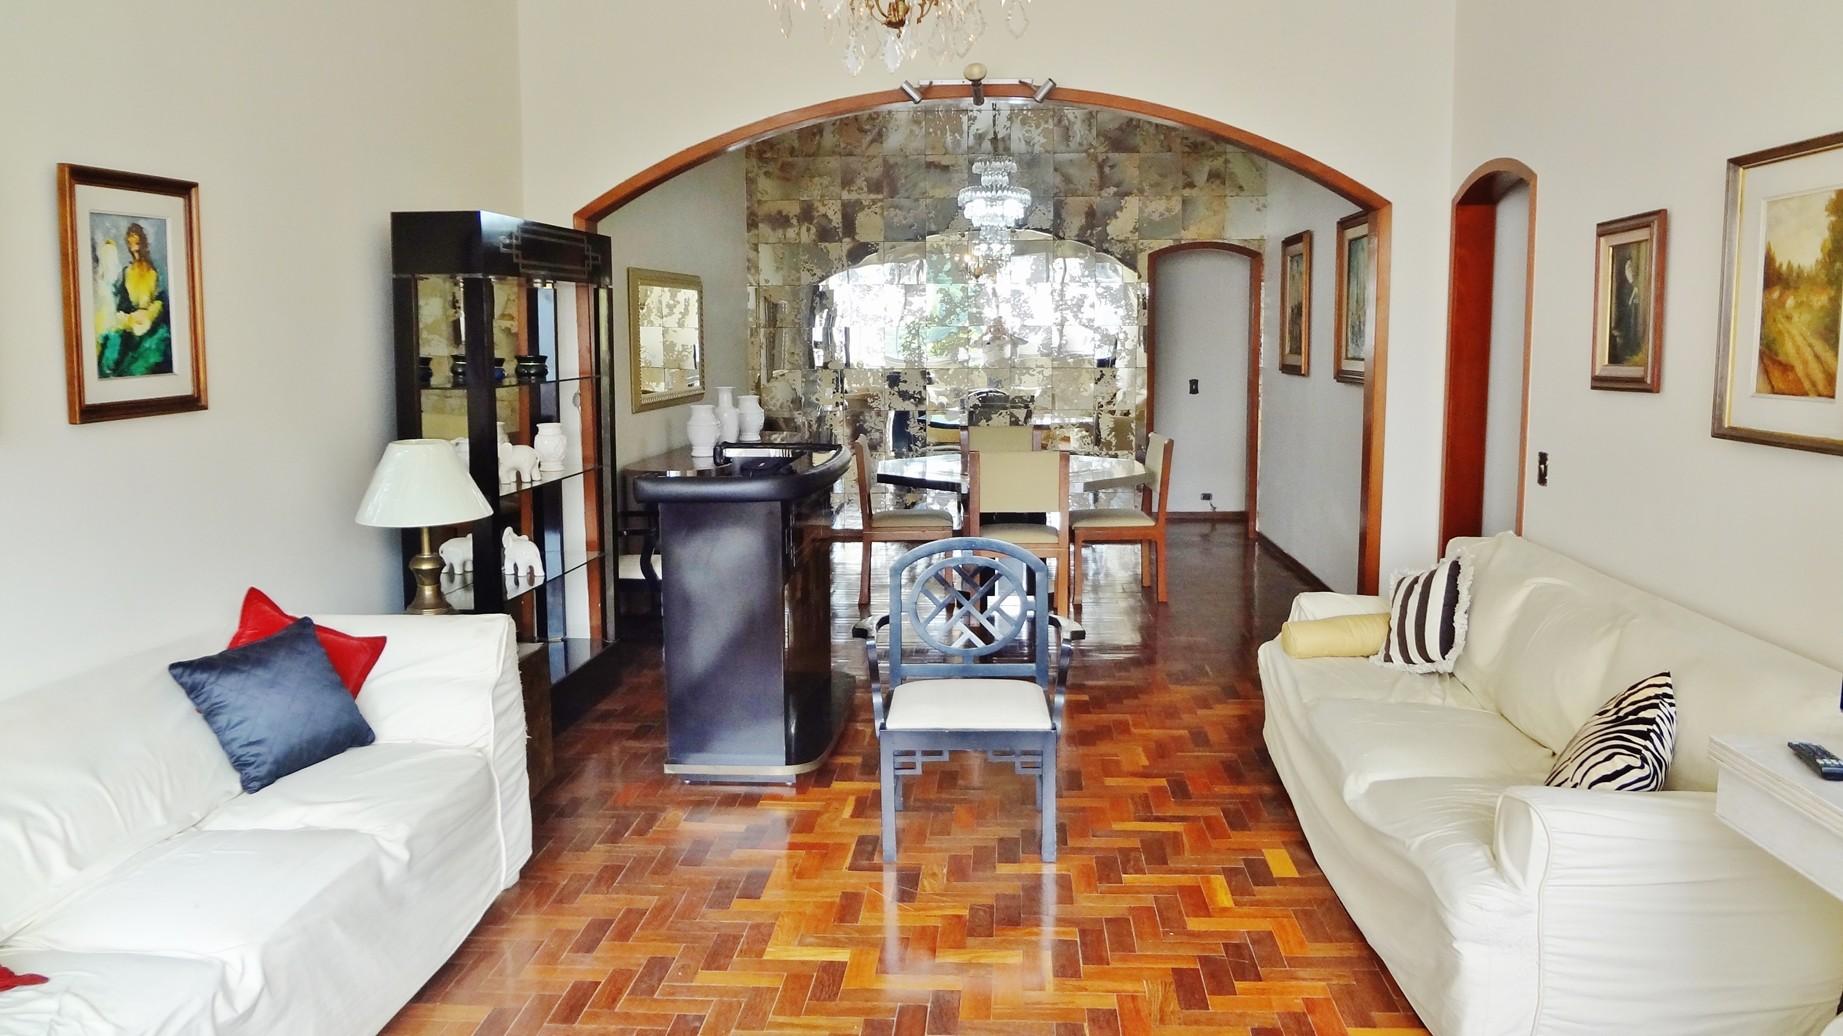 excellent-apartment-04-rooms-best-point-botafogo-e889f4a2e0dc26dae2ec5db98b496ff7